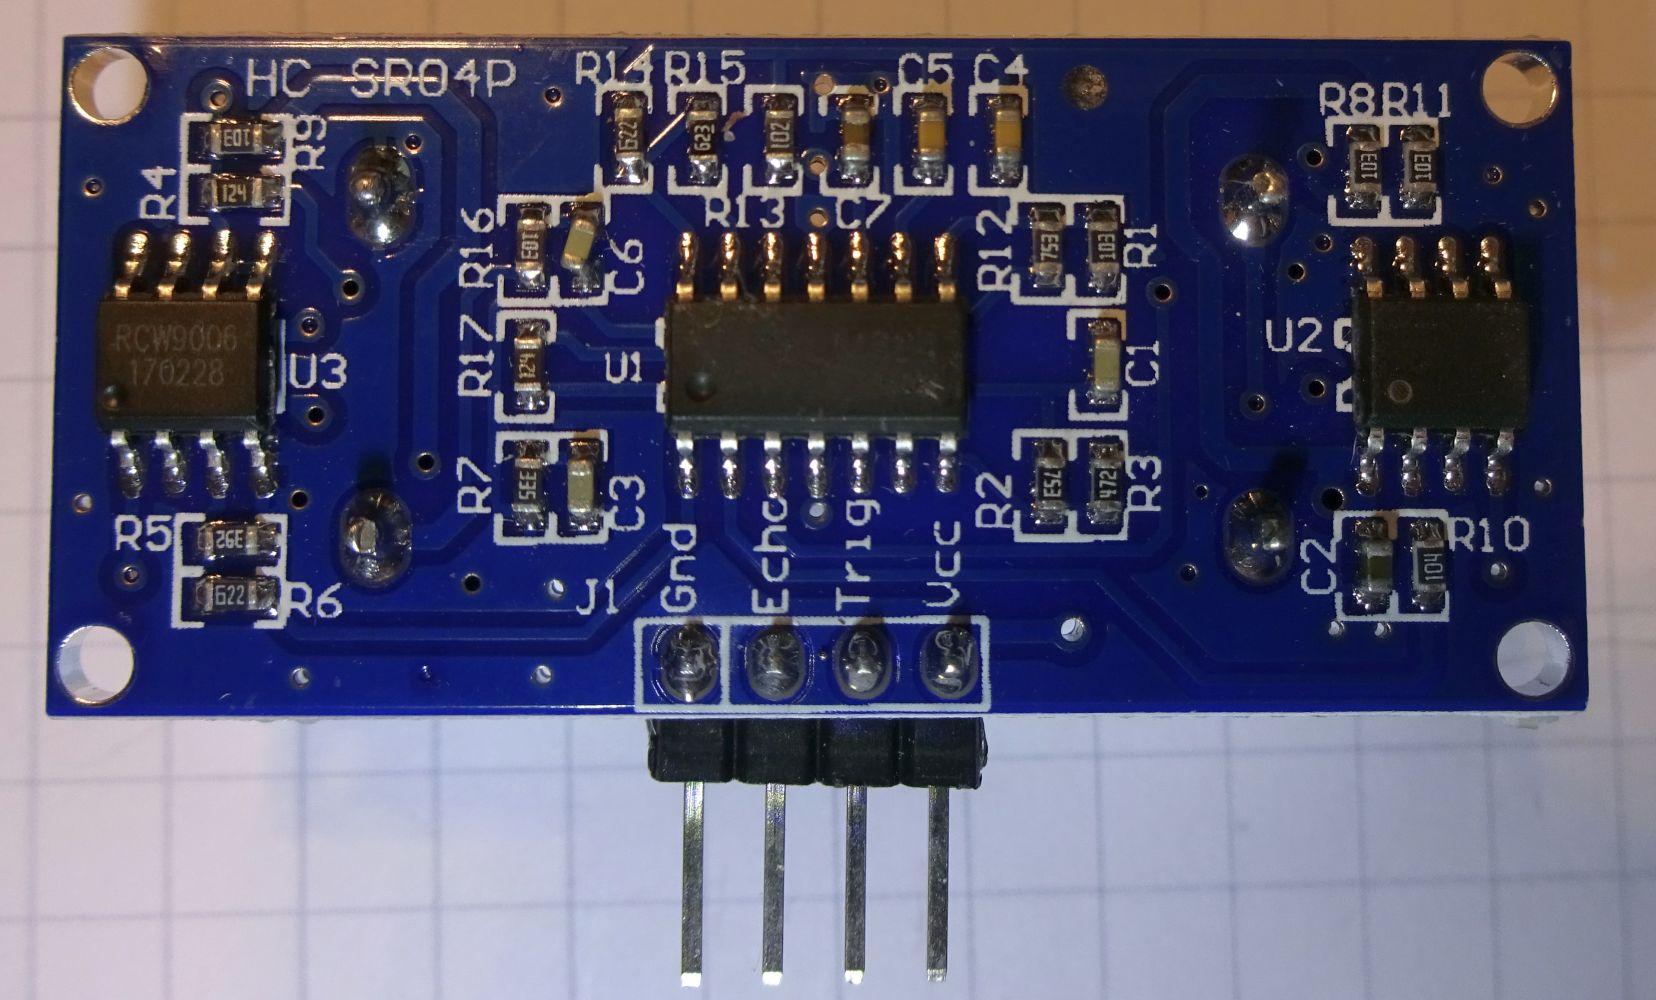 Ultraschall Entfernungsmesser Uem 50 : Arduino ultraschall abstandswarner mit dem multi function